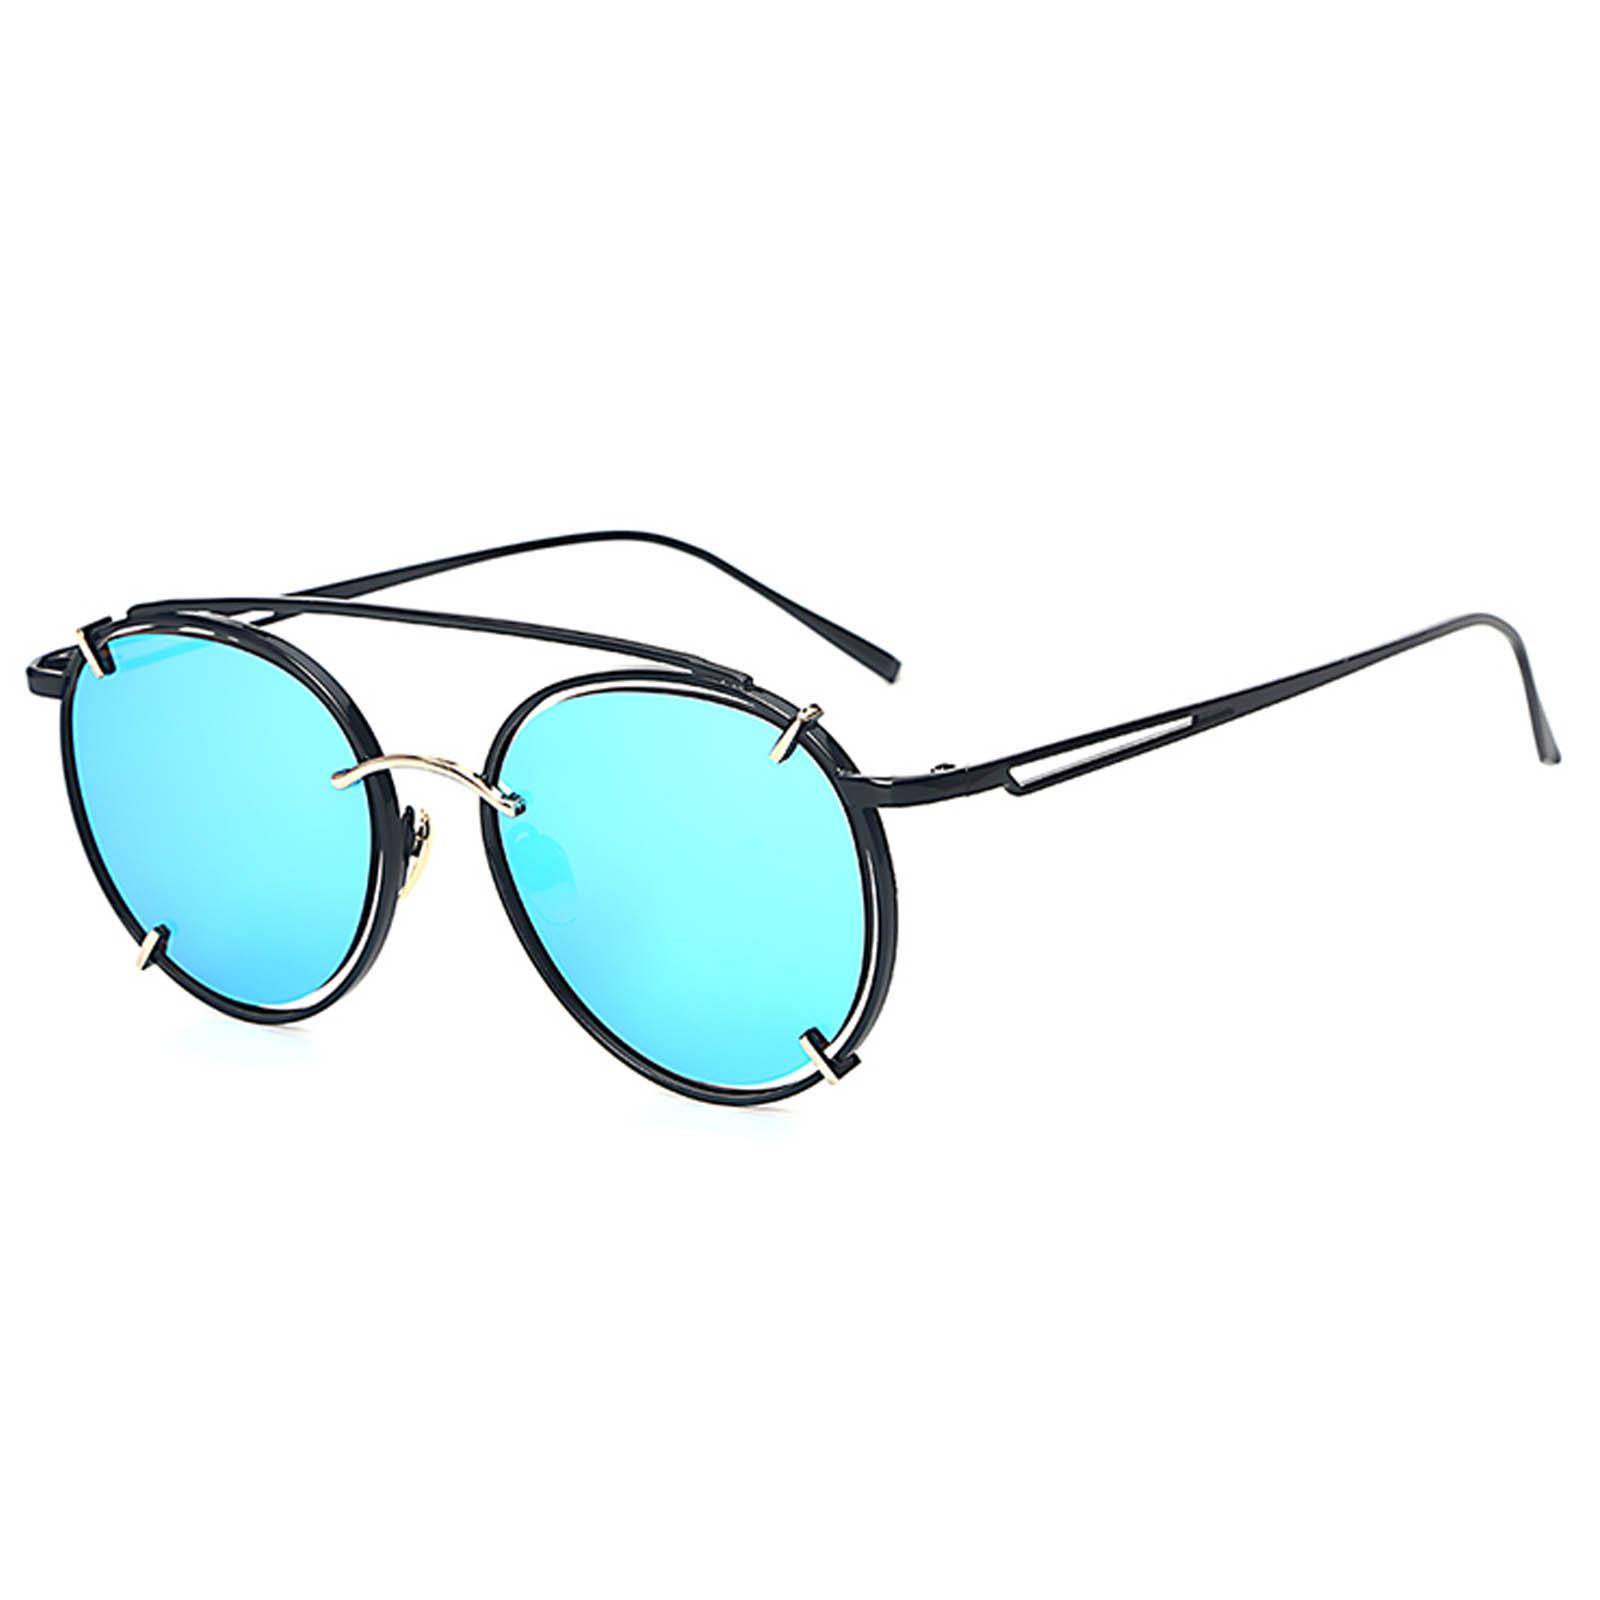 814e5aa586a OWL ® 009 C4 Round Eyewear Sunglasses Women s Men s Metal Round Circle  Black Frame Blue Mirror